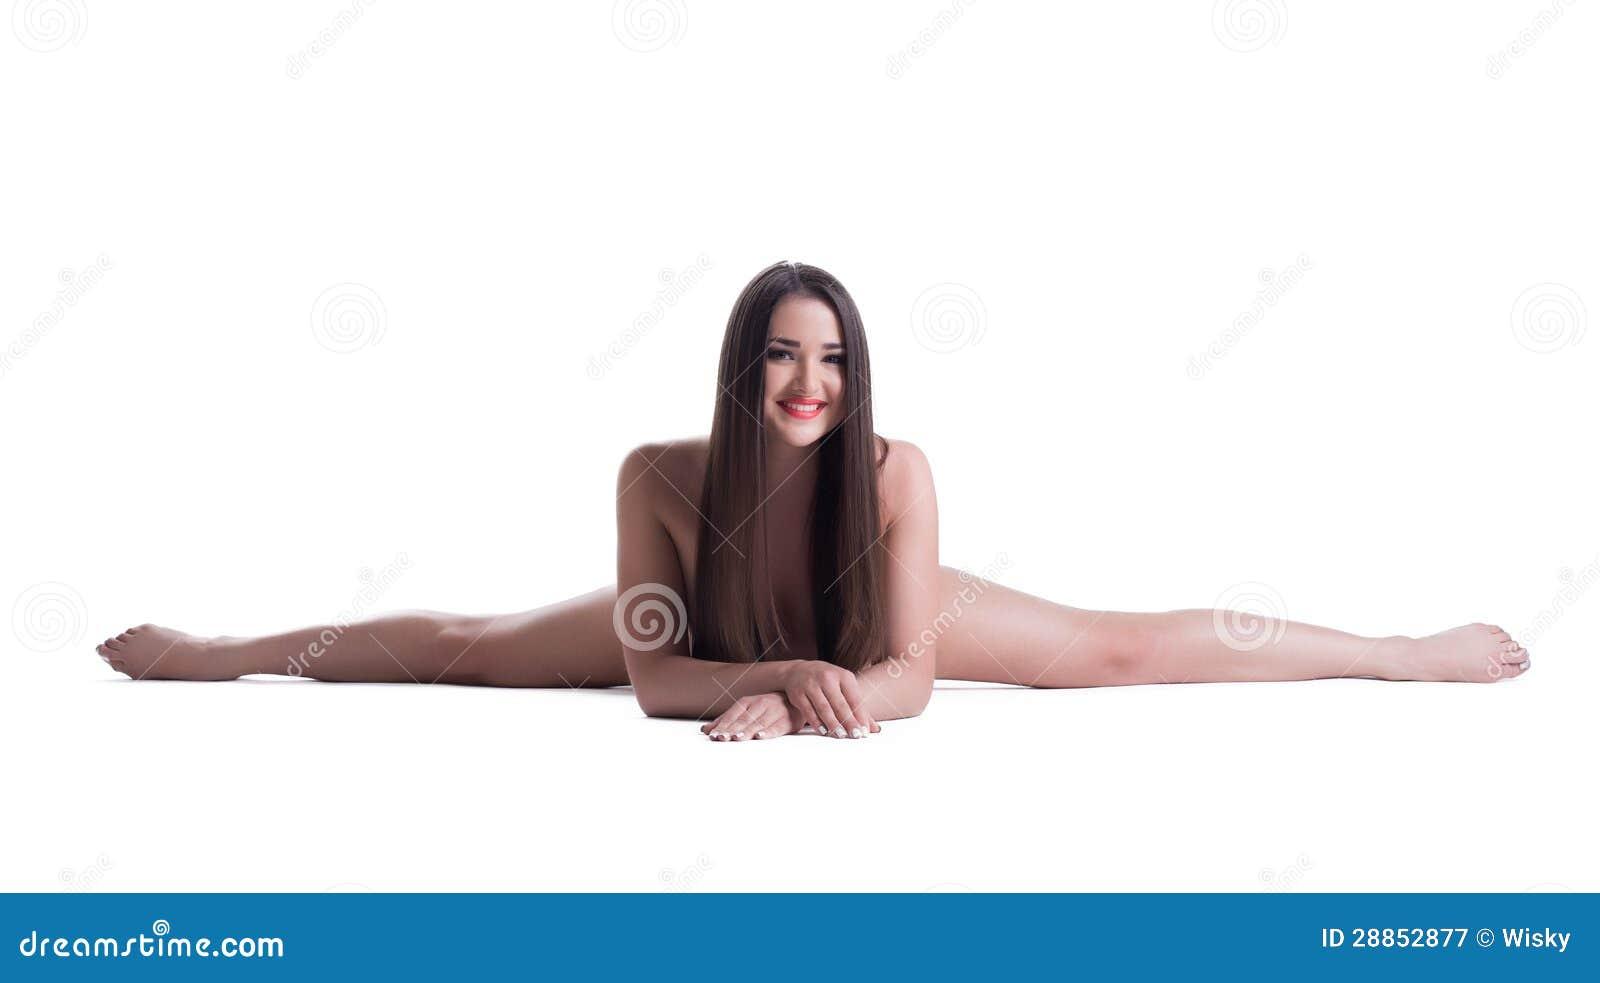 Women Doing The Splits Nude 38